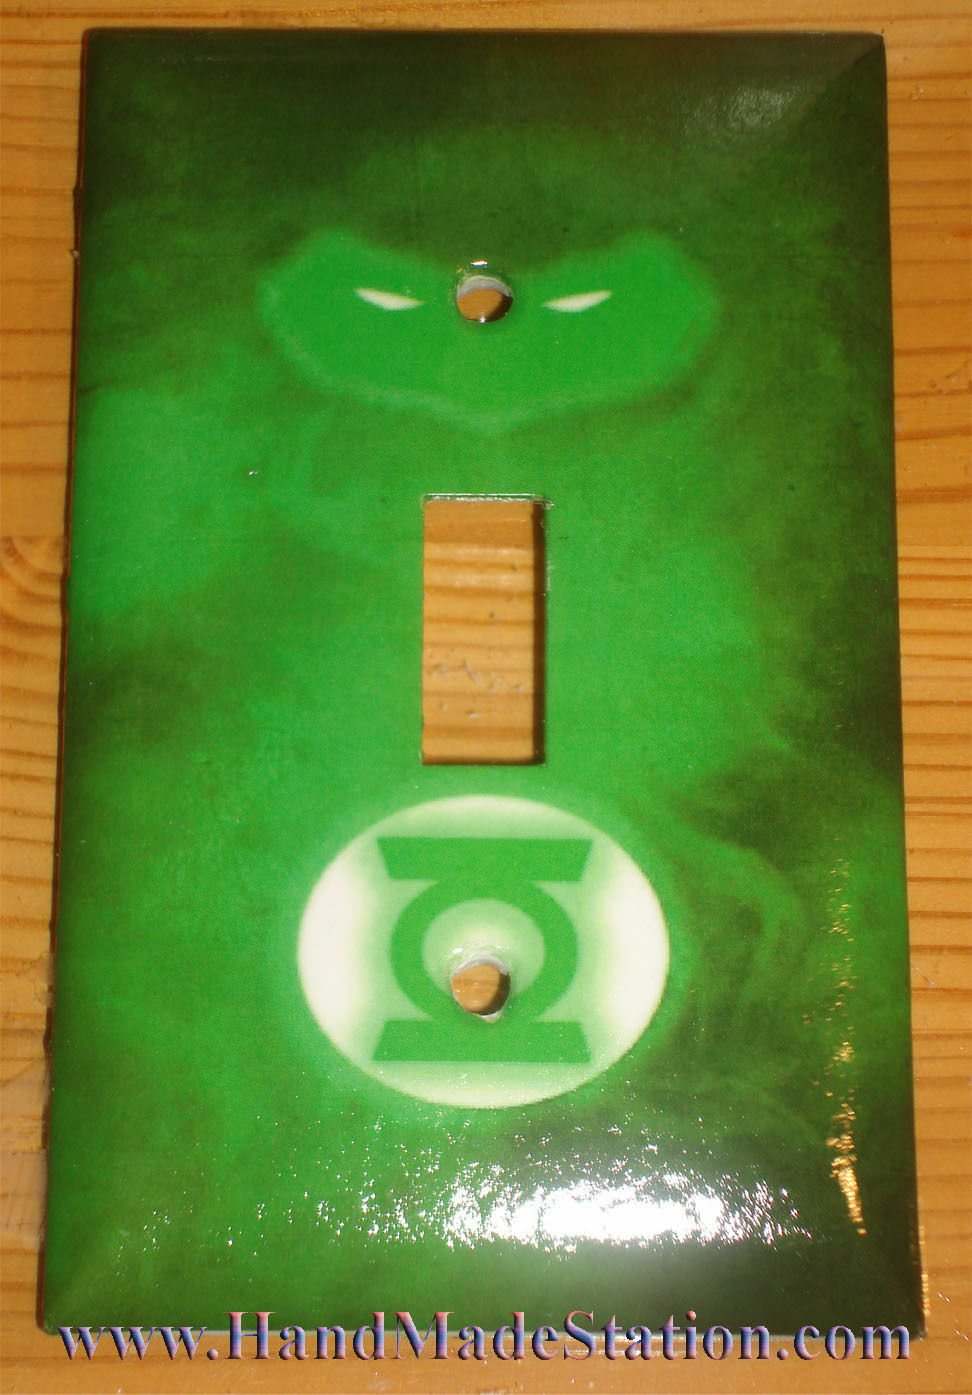 Green light logo single toggle